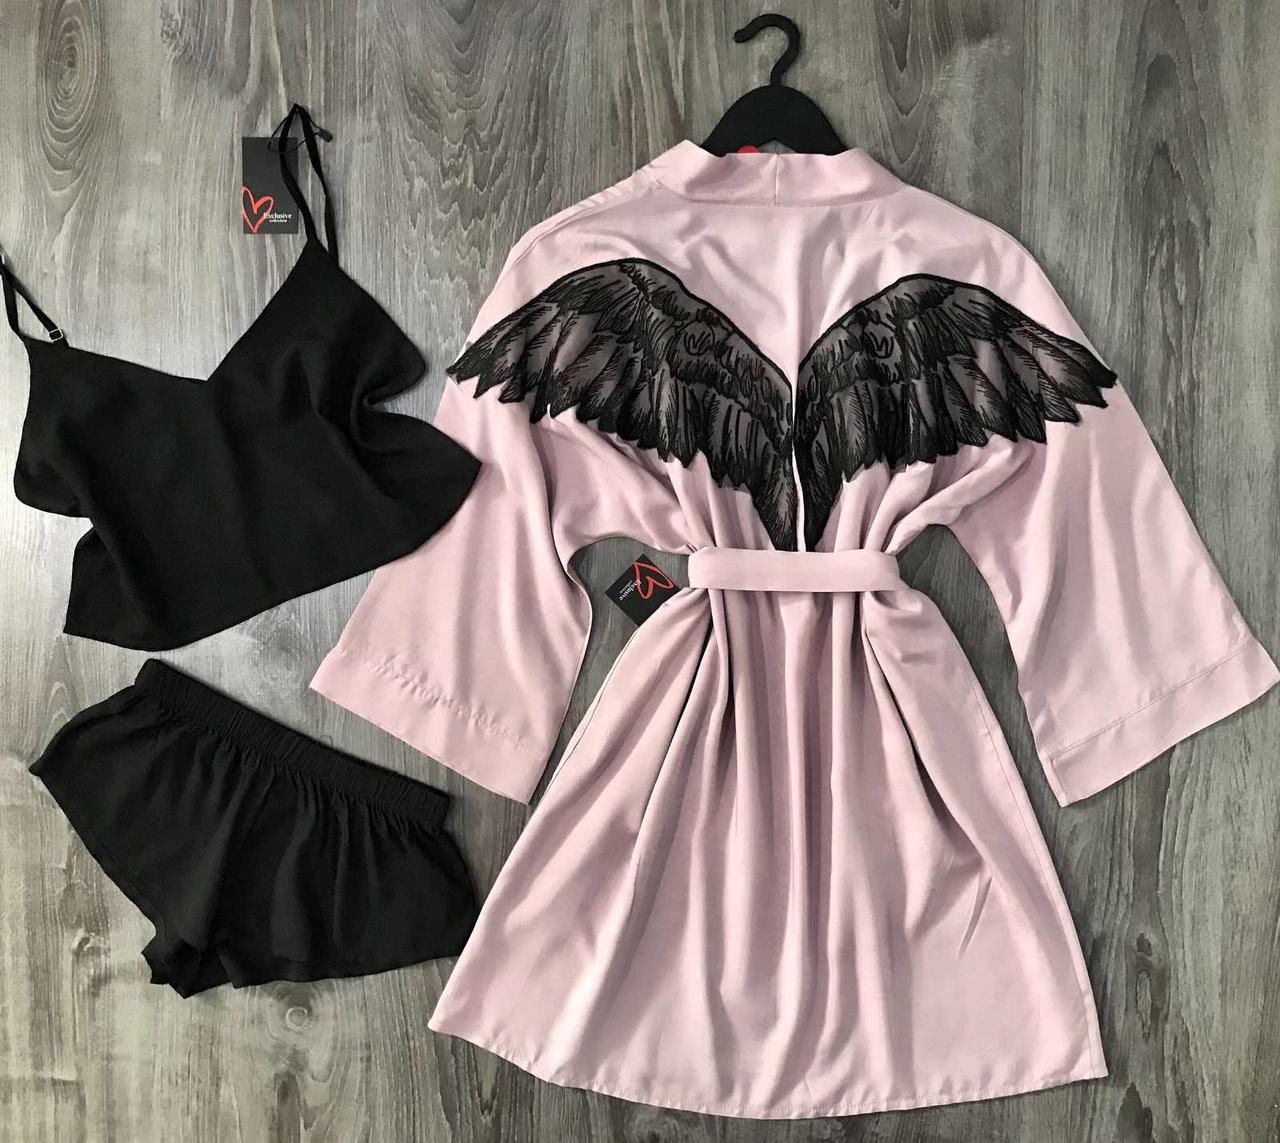 Пудровый хлопковый халат+ пижама